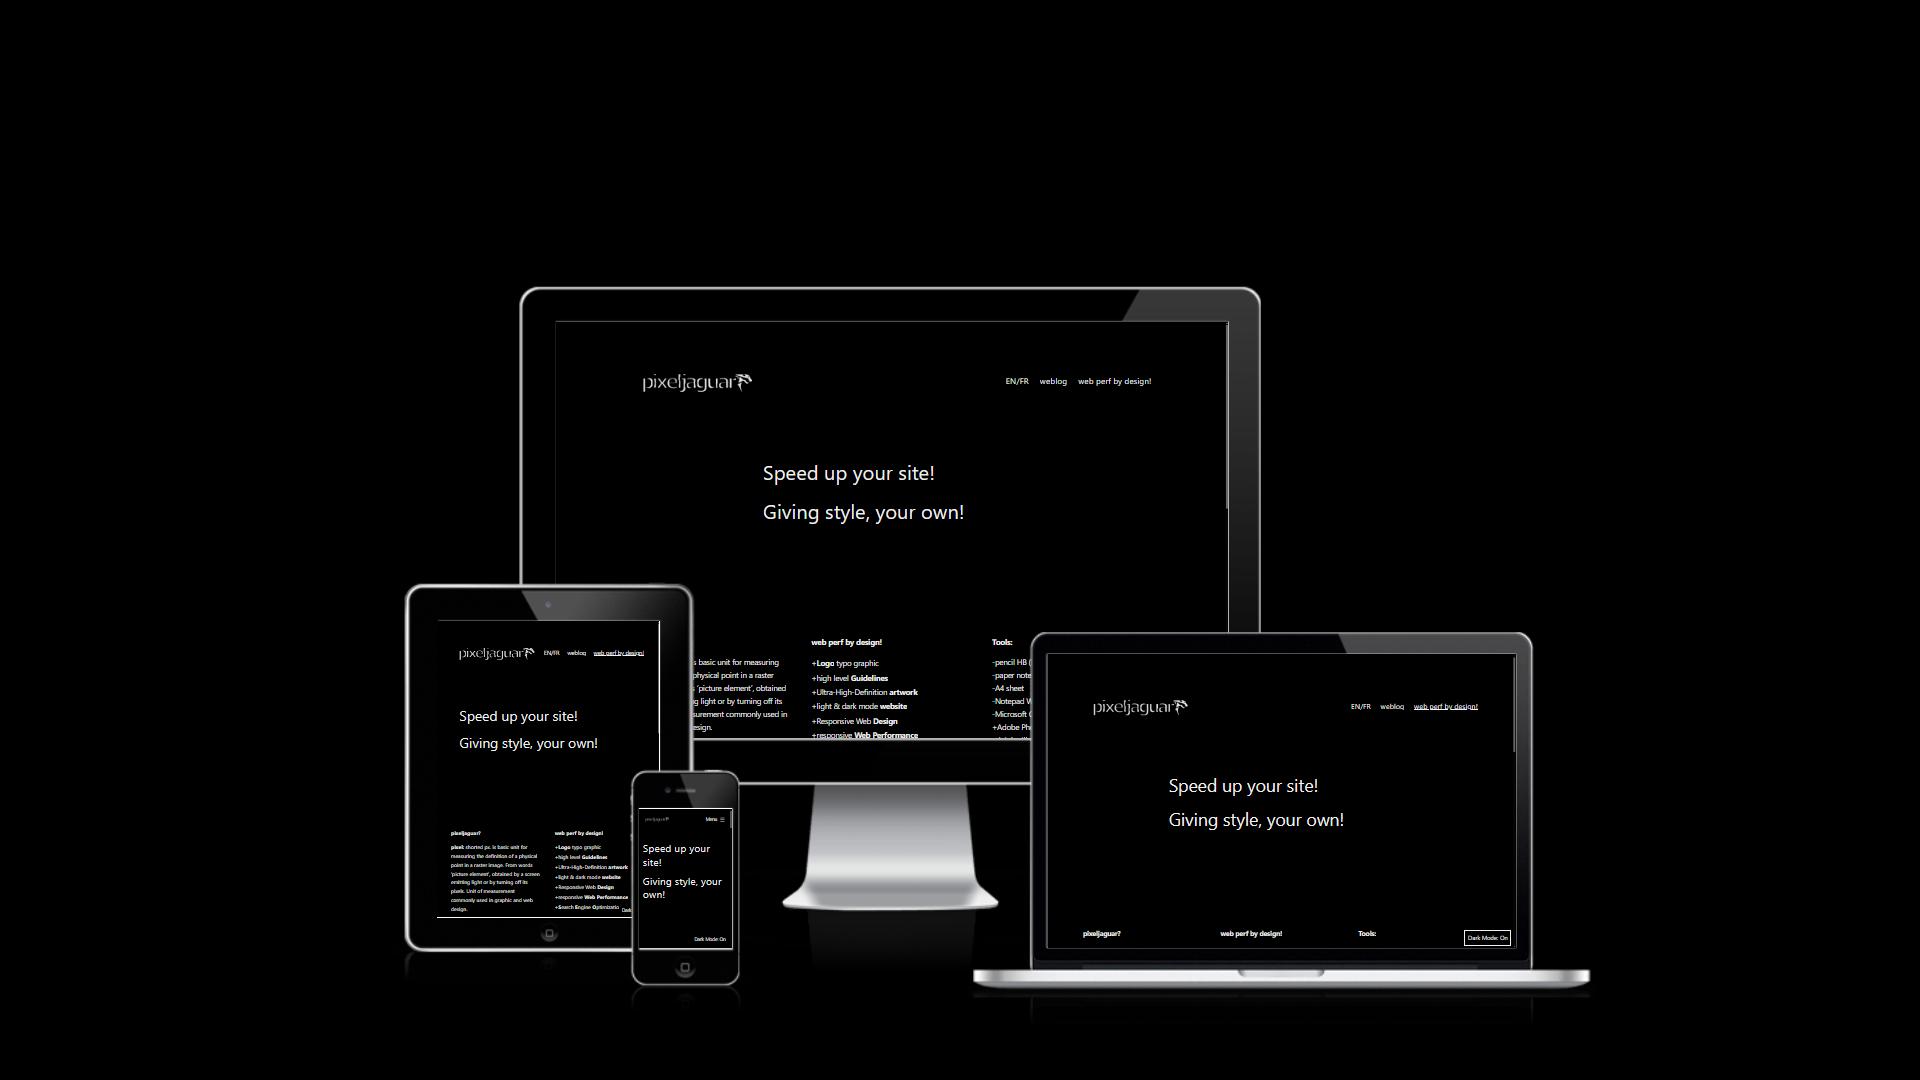 front-responsive-web-design-studio-pixeljaguar-20-by-elj